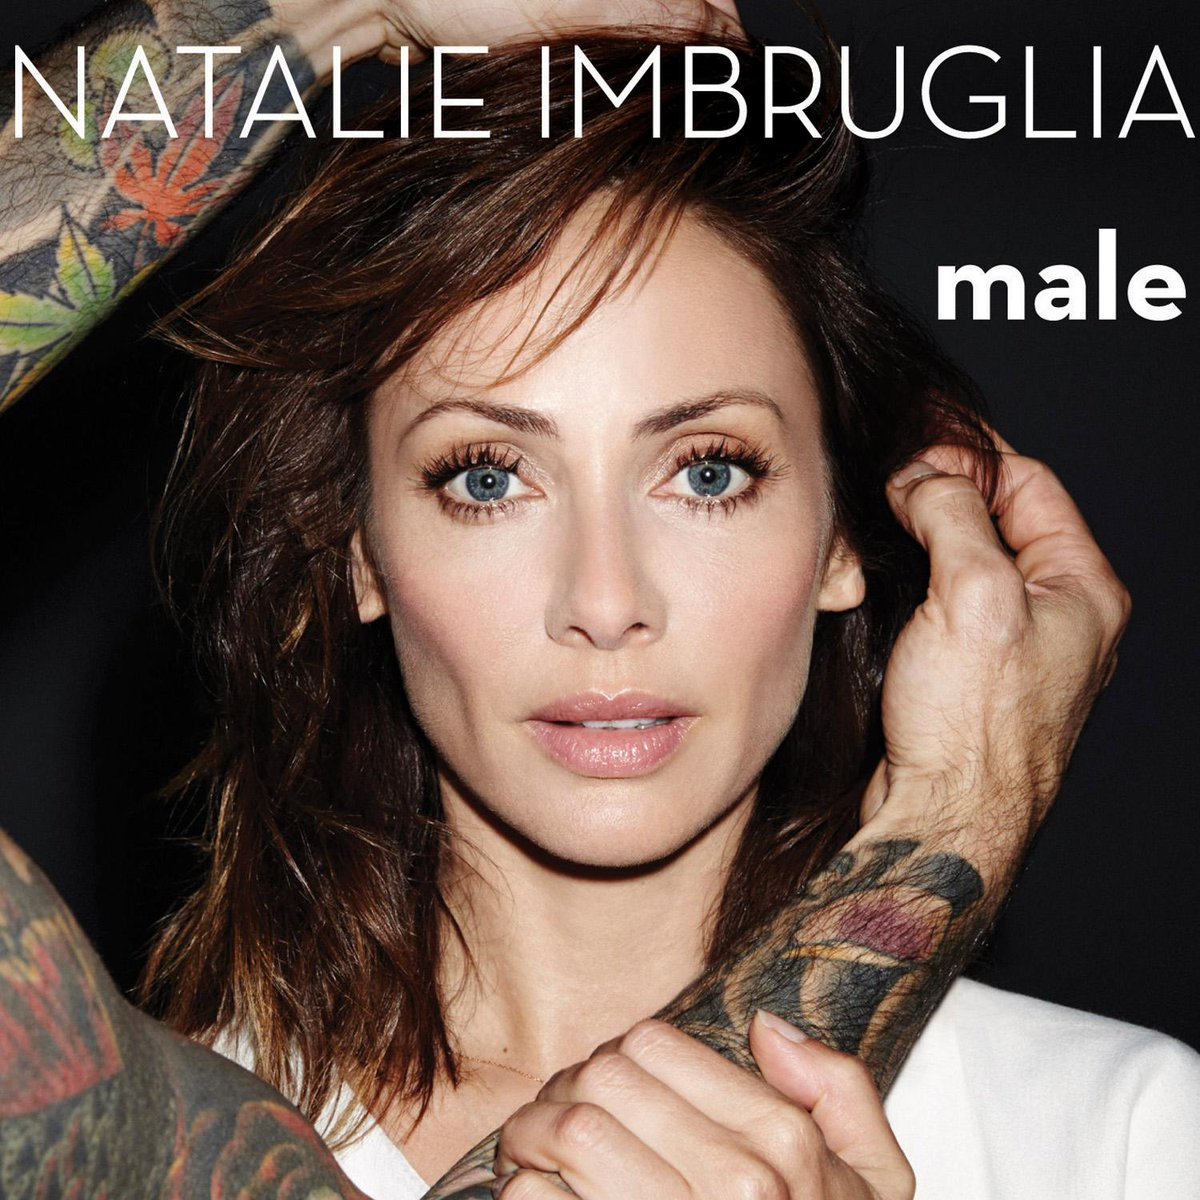 Twitter Natalie Imbruglia nudes (84 photo), Ass, Paparazzi, Selfie, swimsuit 2017